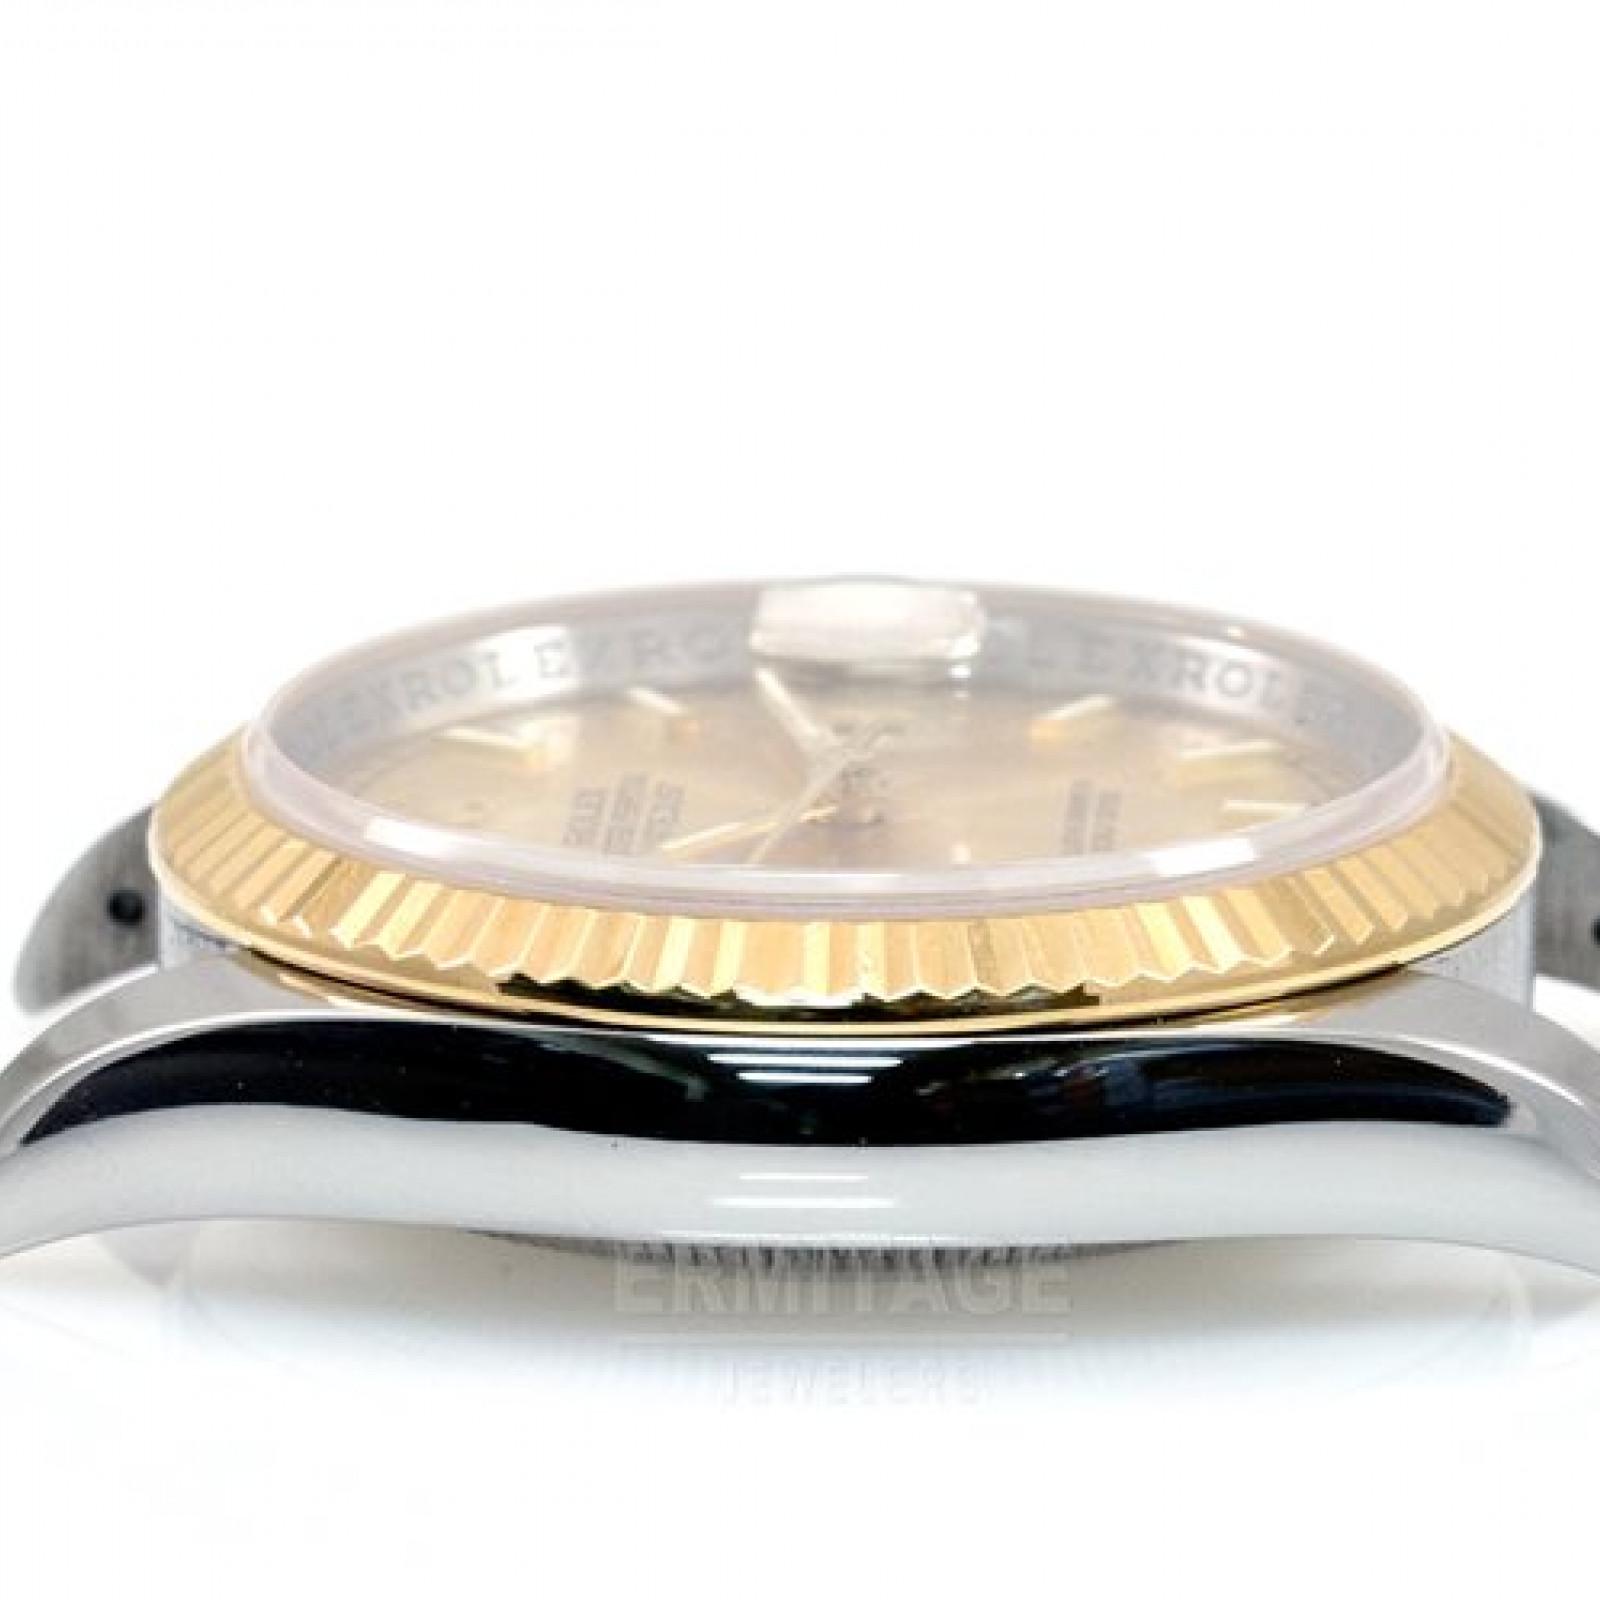 Rolex Datejust 116233 Gold & Steel 36 mm